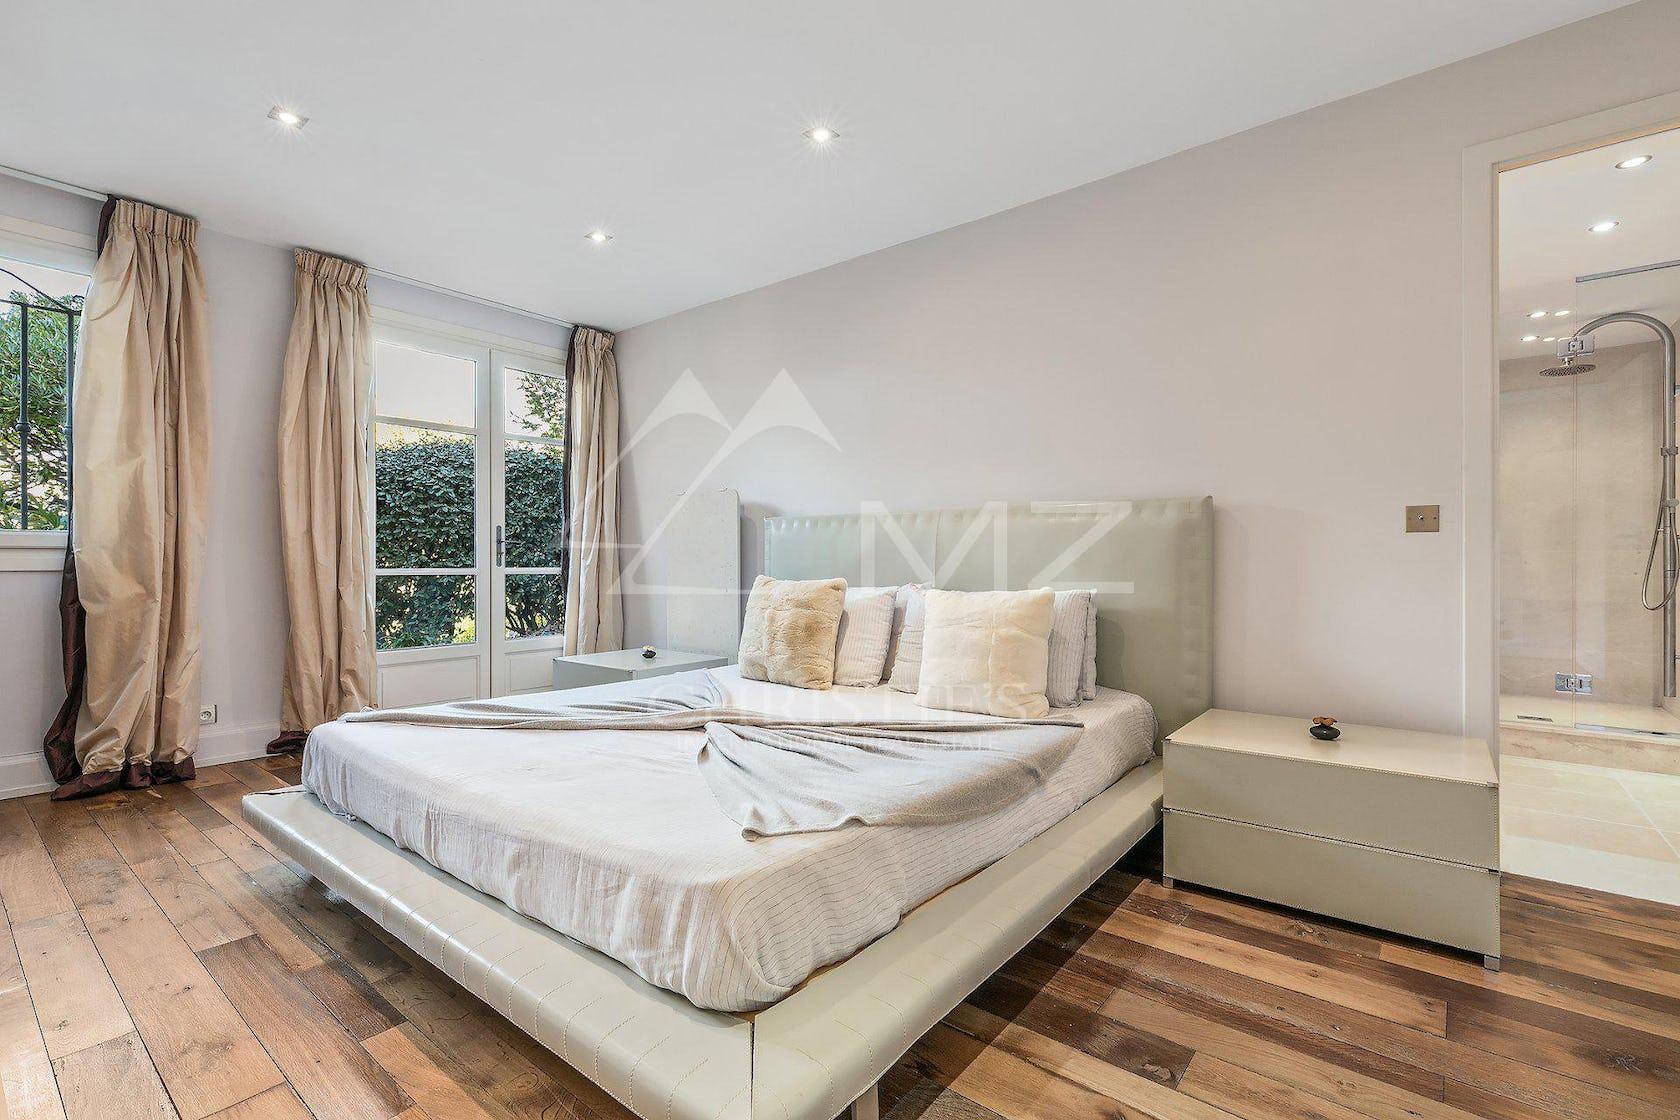 bedroom room indoors flooring furniture wood floor hardwood bed